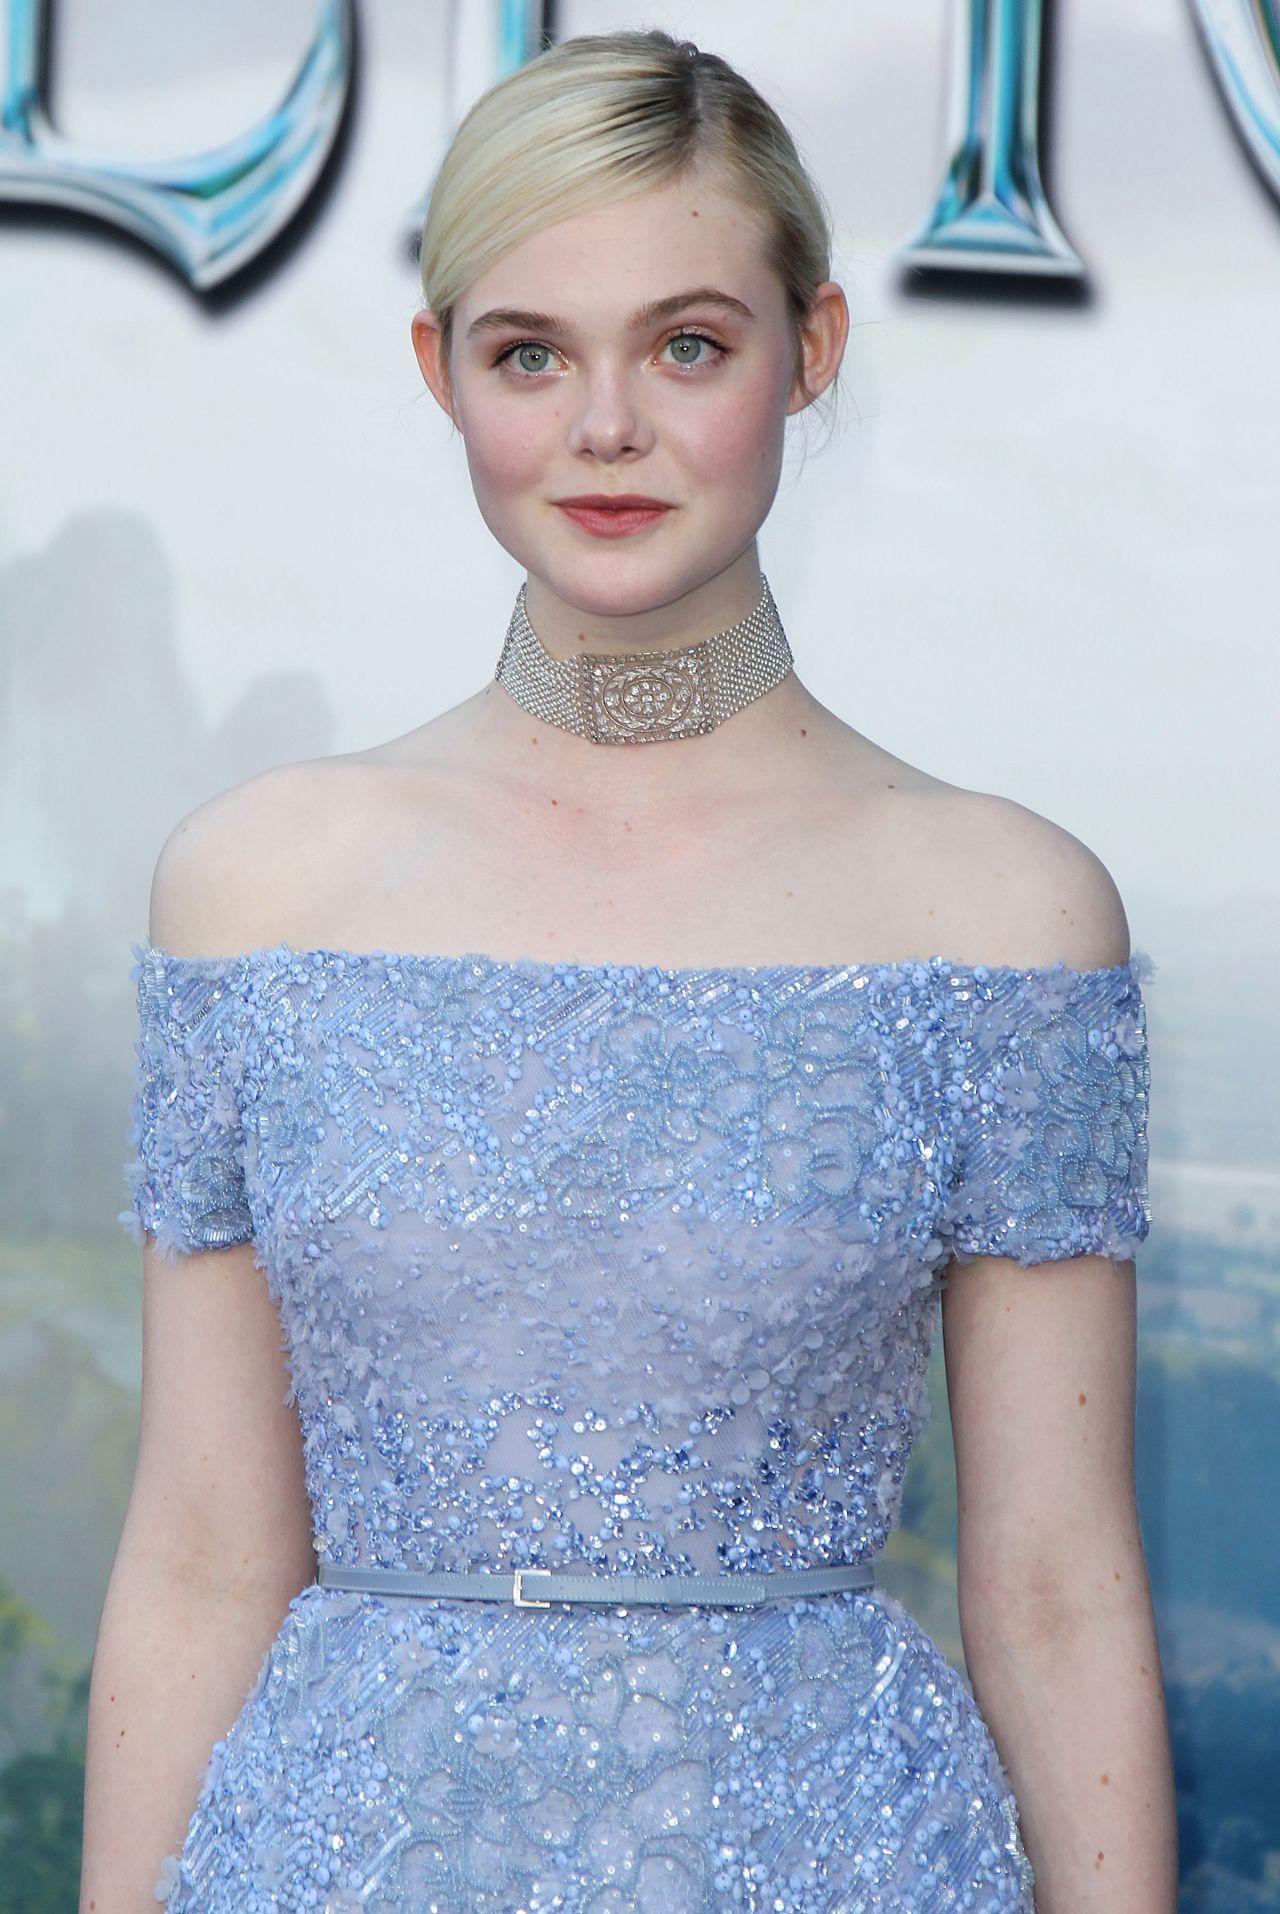 Elle Fanning Photo 31661692: 'Maleficent' World Premiere In Los Angeles